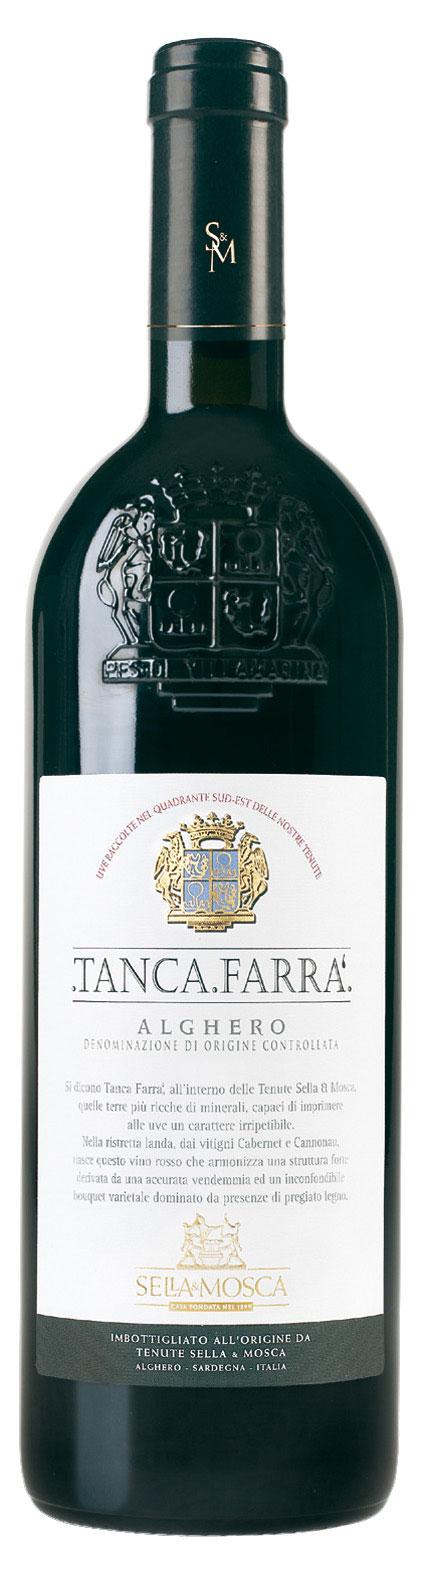 2011 Sella & Mosca Tanca Farrá Alghero DOC